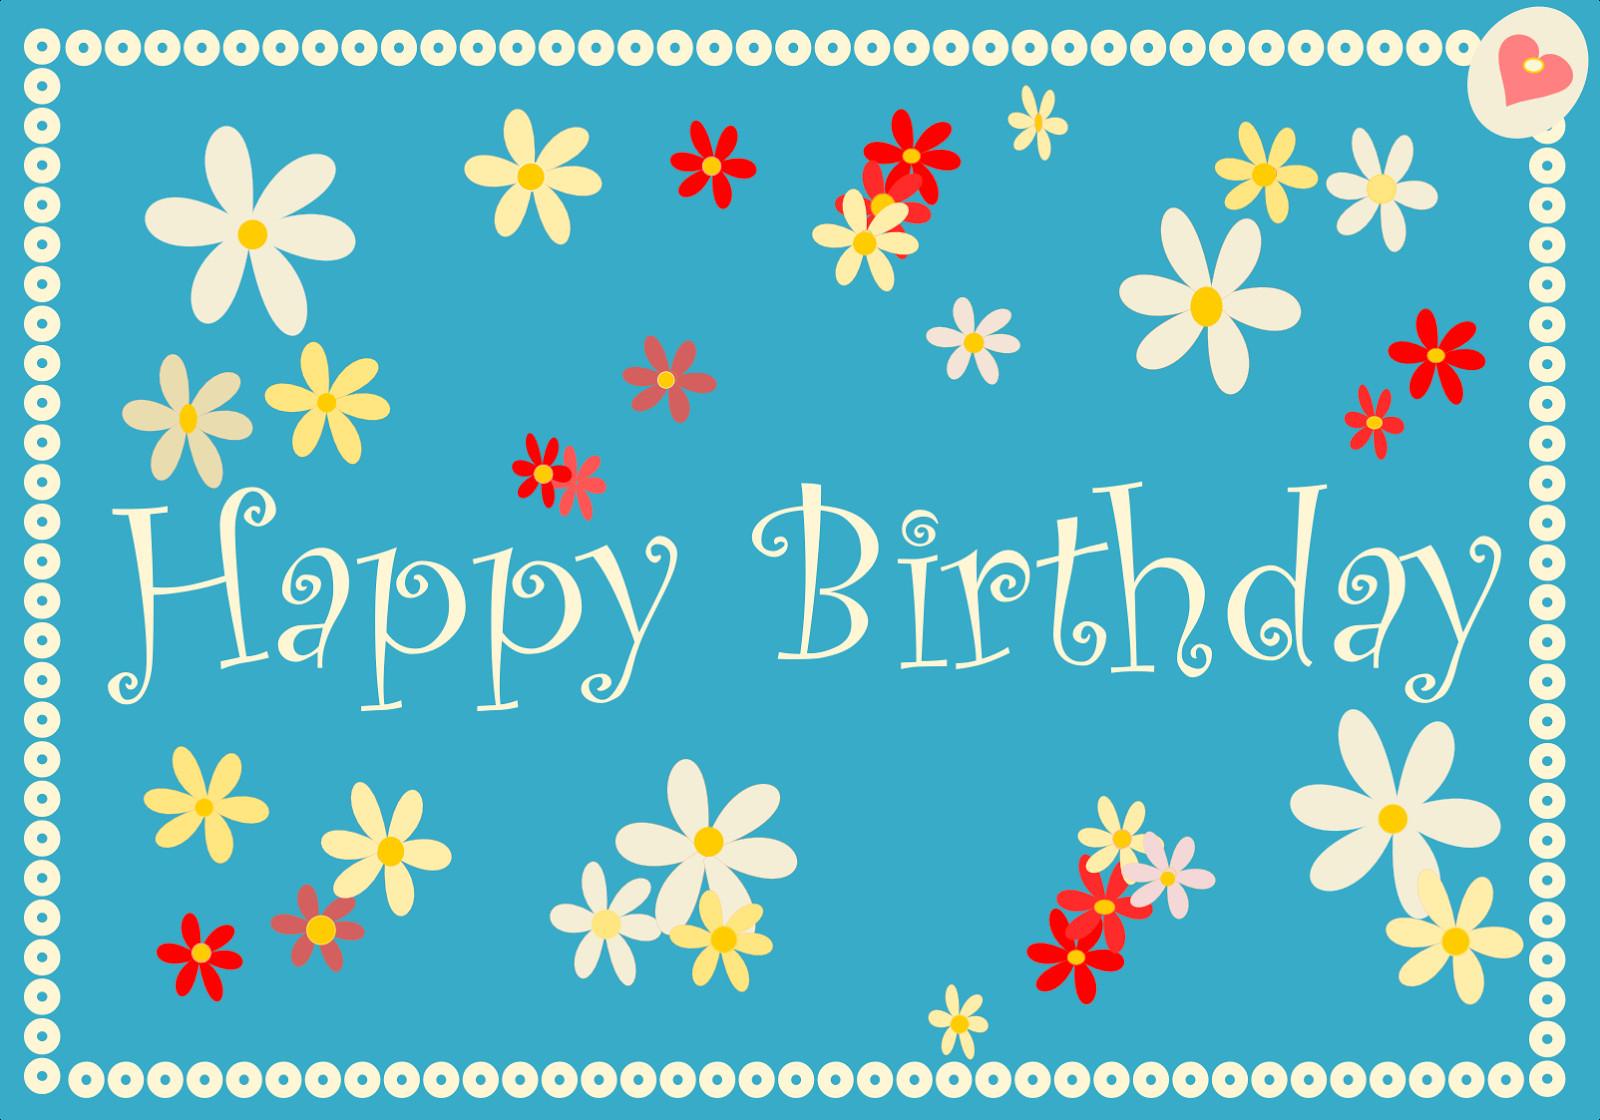 Free Online Printable Birthday Cards | Dozor - Free Online Printable Birthday Cards